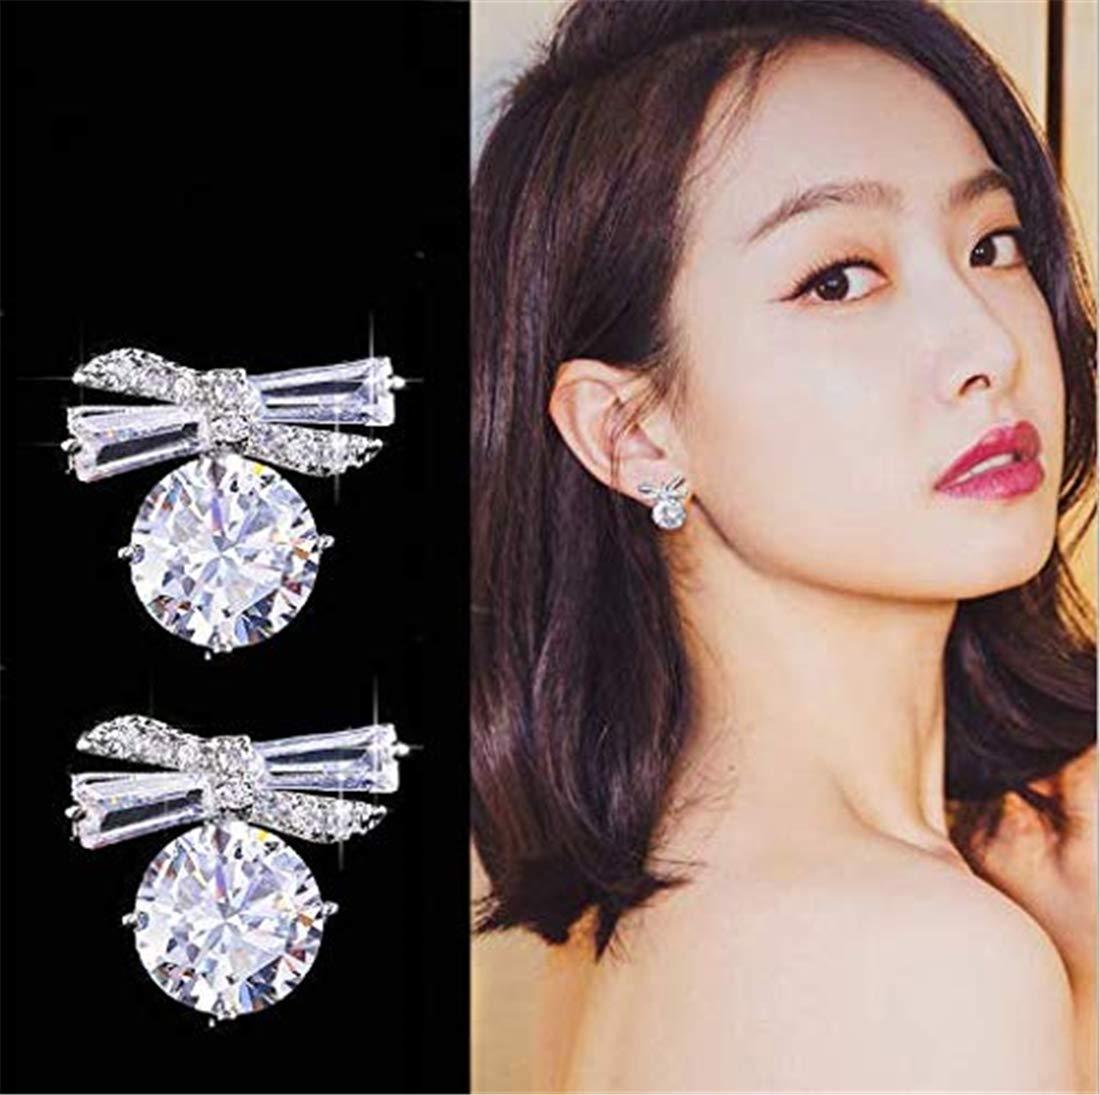 Heyuni.Fashion Girls Bow Crystal Stud Earrings Surgical